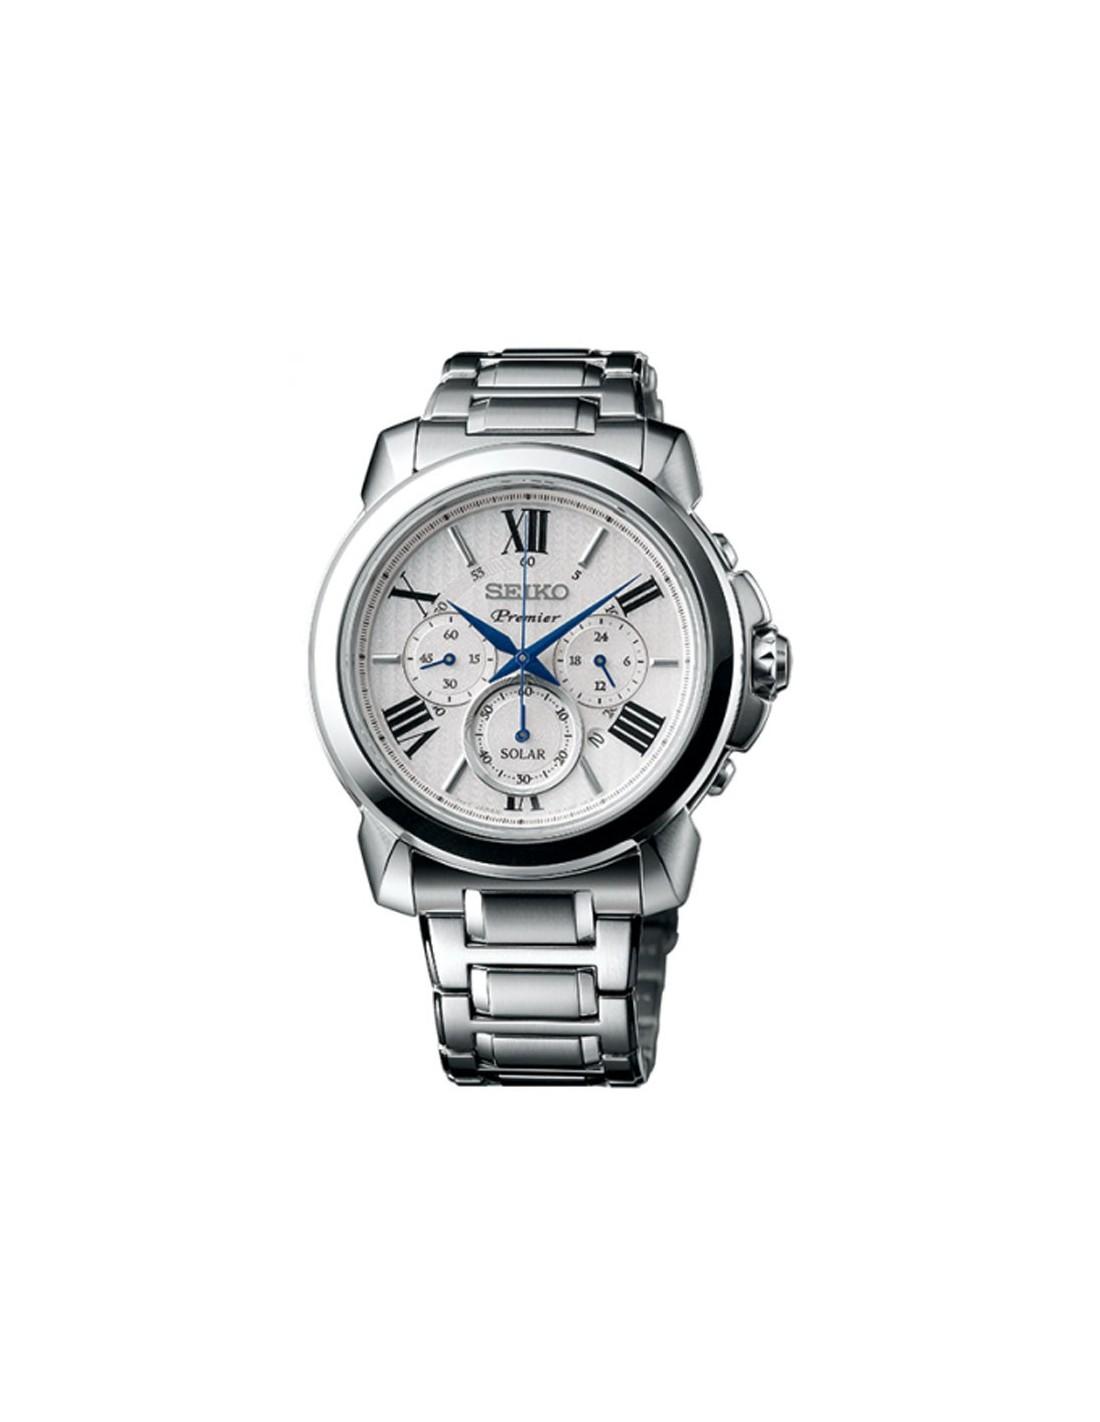 8aa2cad28c9c Reloj Seiko Premier Solar SSC595P1 ...